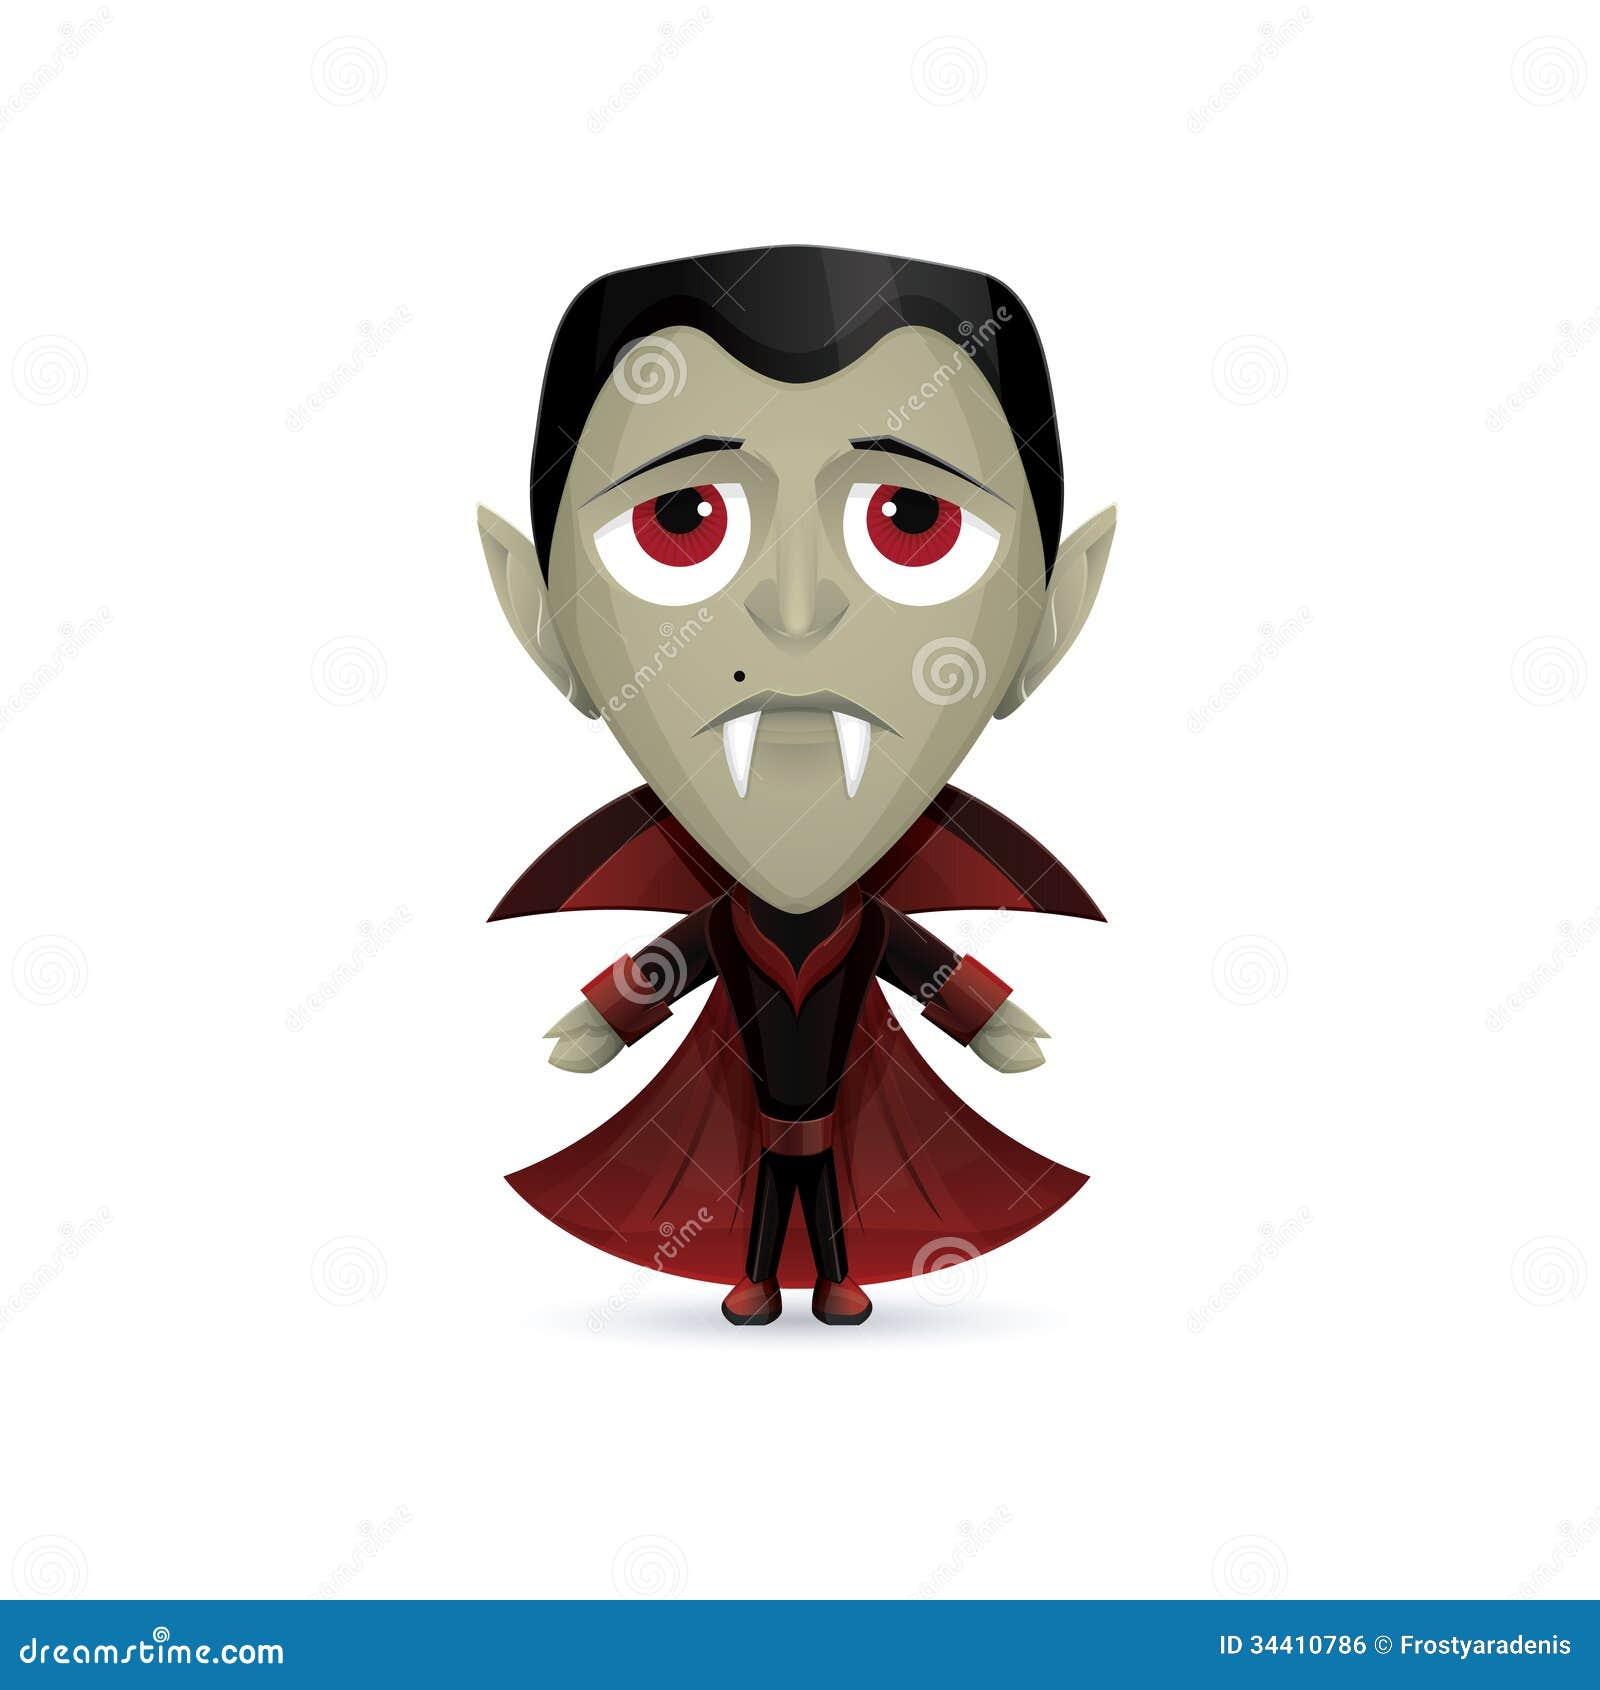 dracula-character-sad-vampire-dark-suit-mole-near-his-nose-34410786.jpg